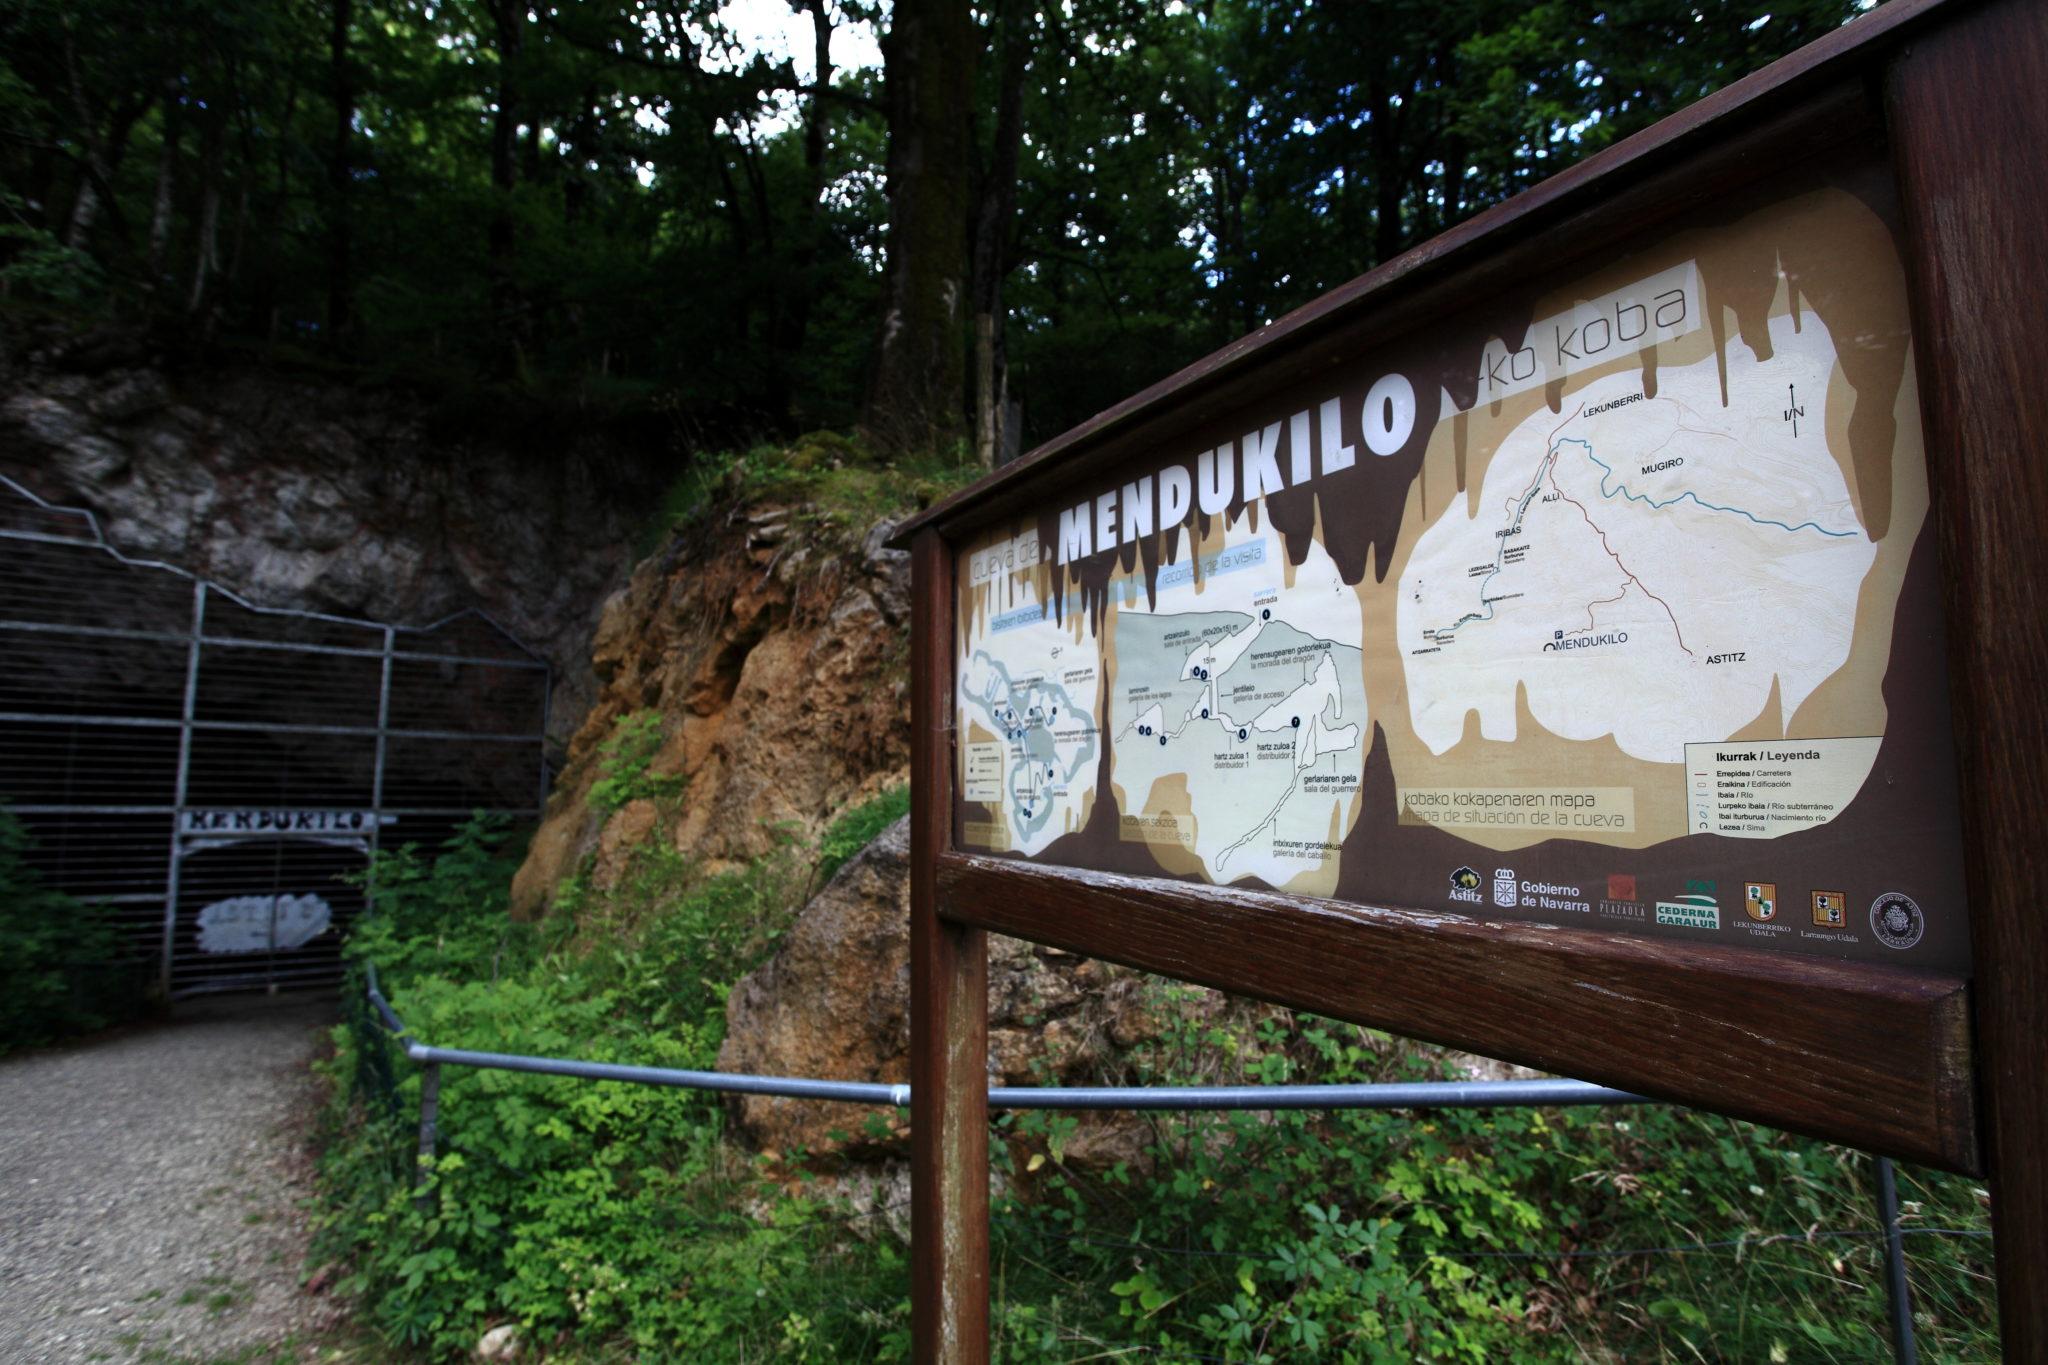 Entrada de la Cueva Mendukilo